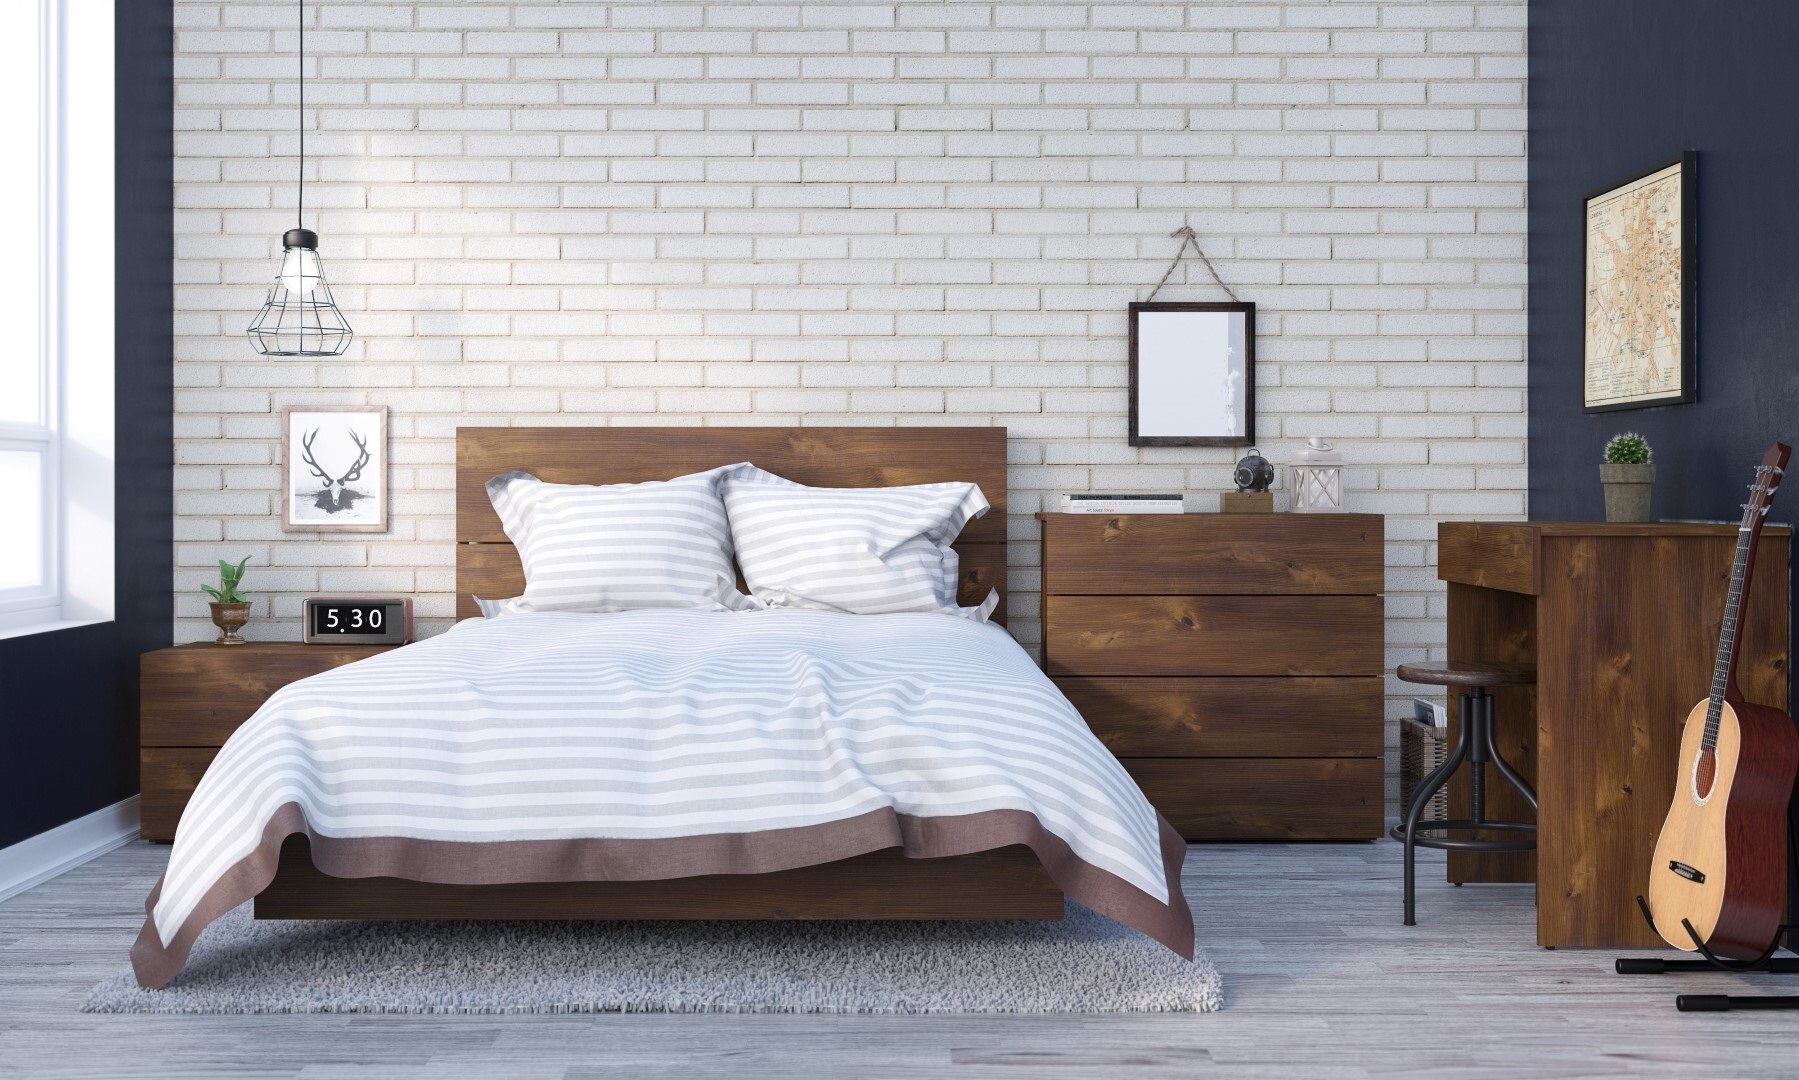 Union Rustic Kaylee Full/Double Platform Bed & Reviews   Wayfair on